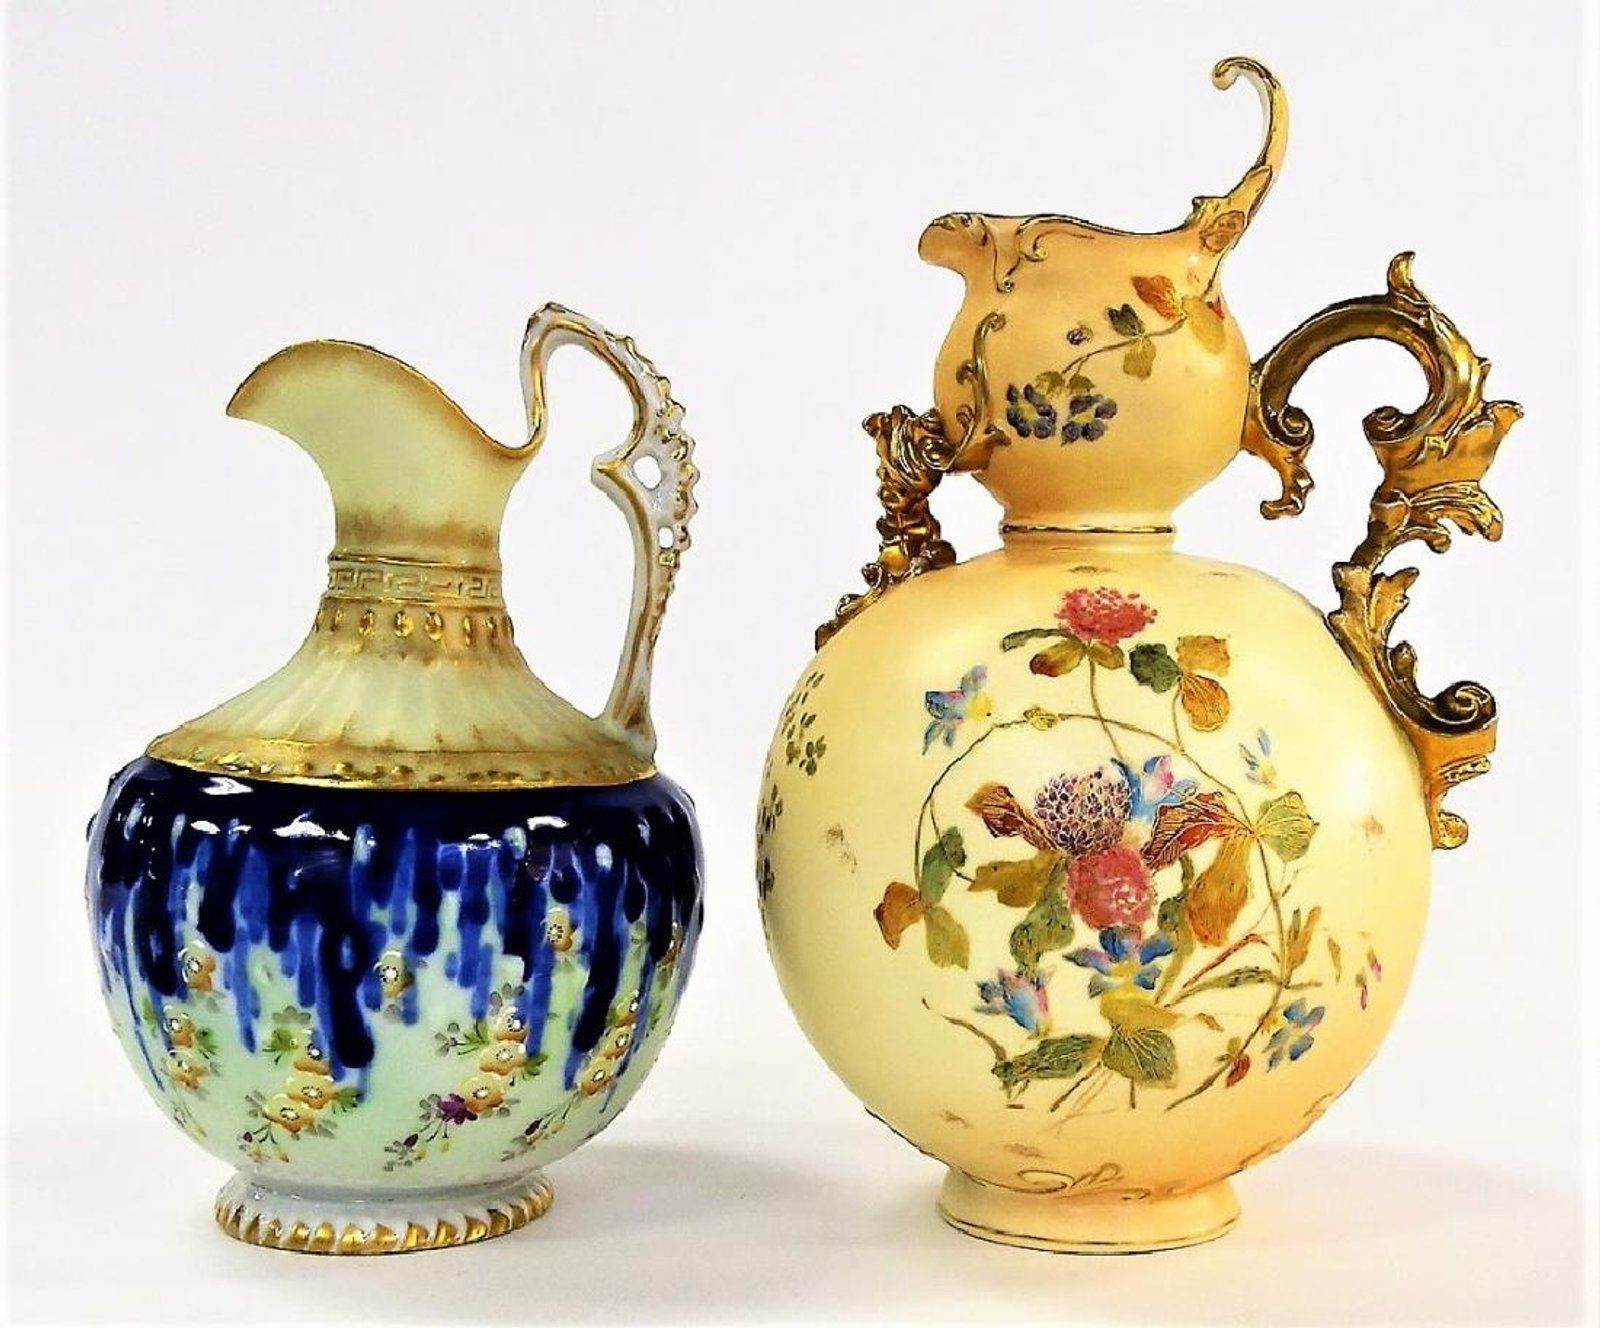 japanese cloisonne vase value of 2 antique continental hand painted ewers keramia porcelan vazak intended for 2 antique continental hand painted ewers